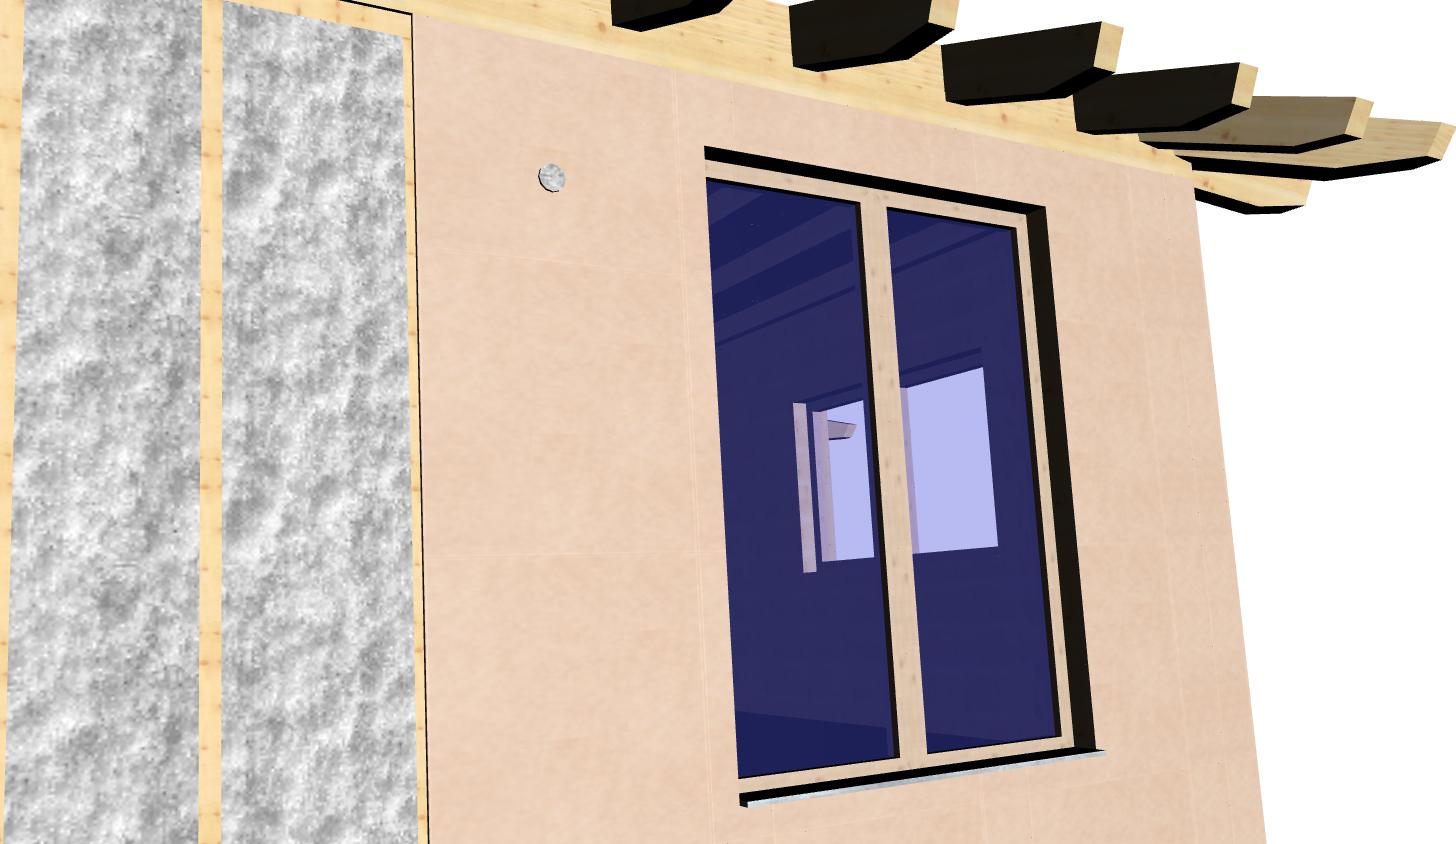 VISKON V15 3D-CAD/CAM HOLZRAHMENBAU   Sektor B - Jahresmiete mit Softwarepflege & Wartung